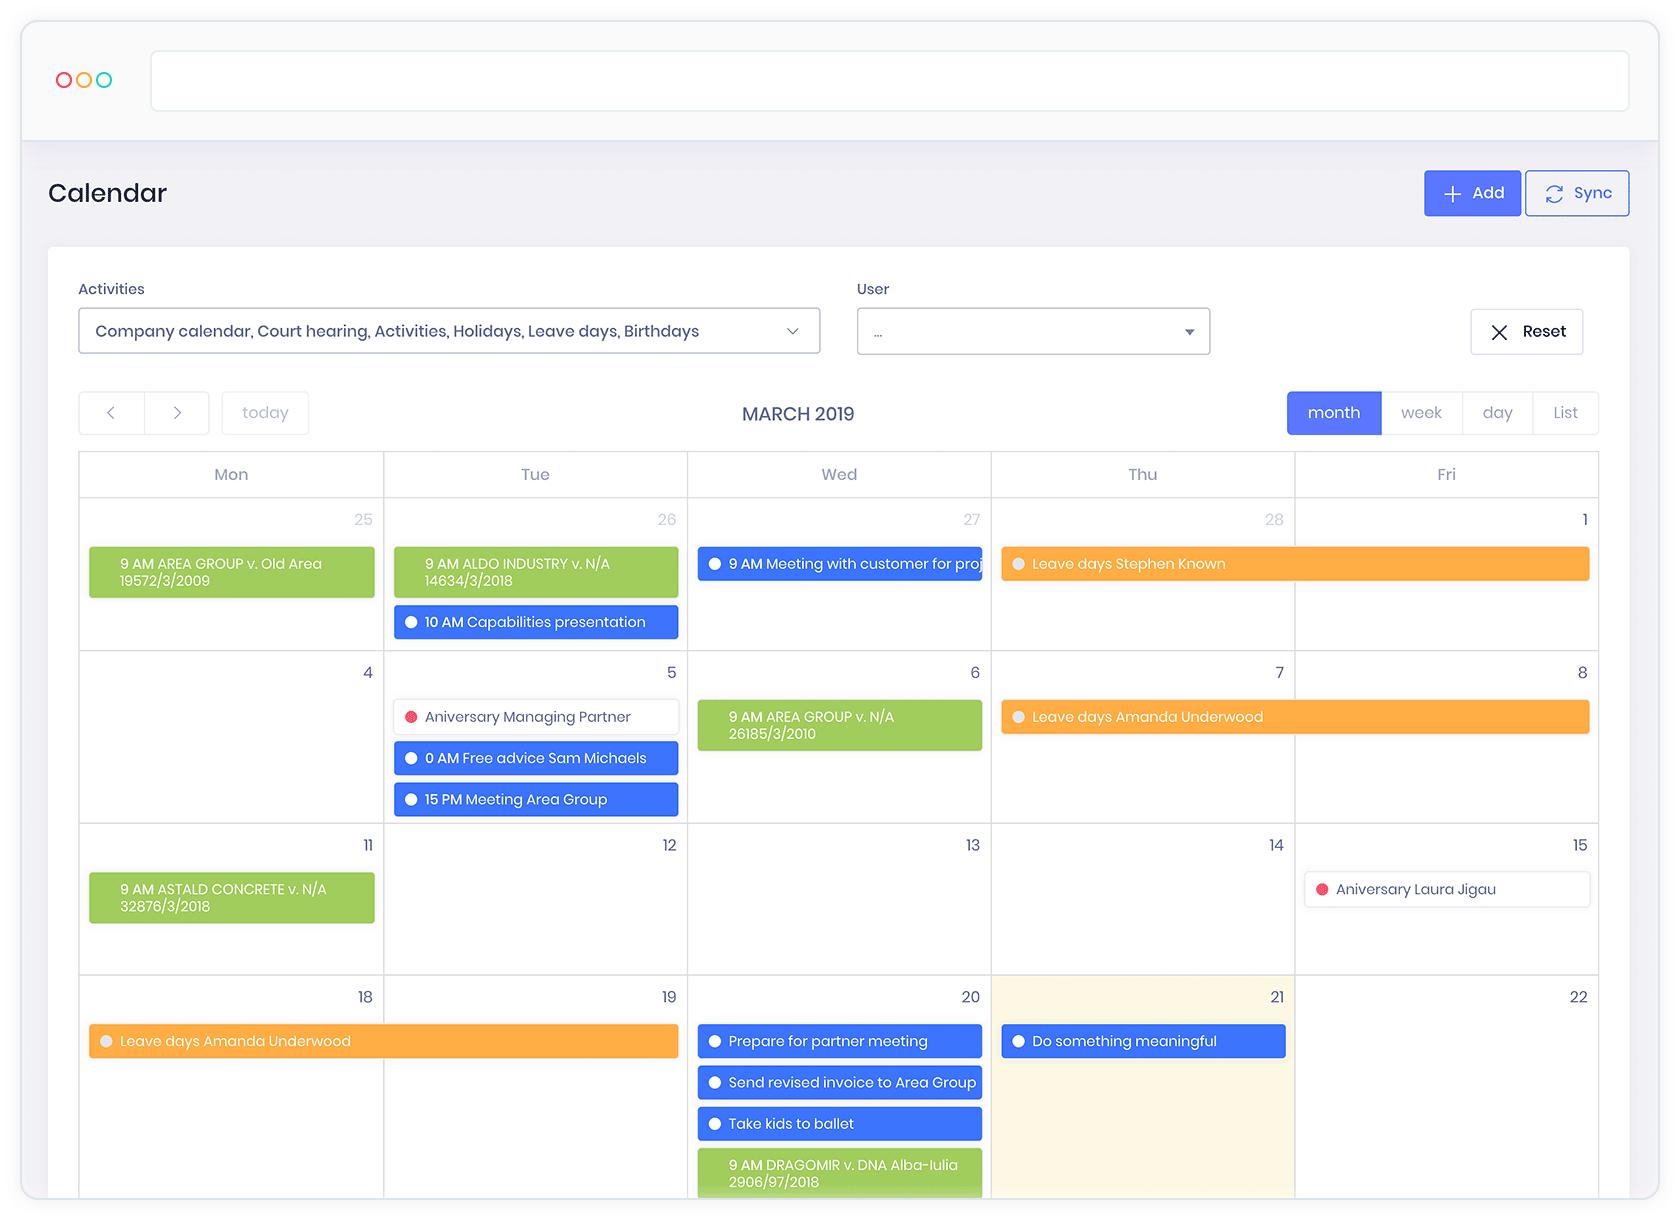 Calendar litigii - Keyvision PRO, soft avocati